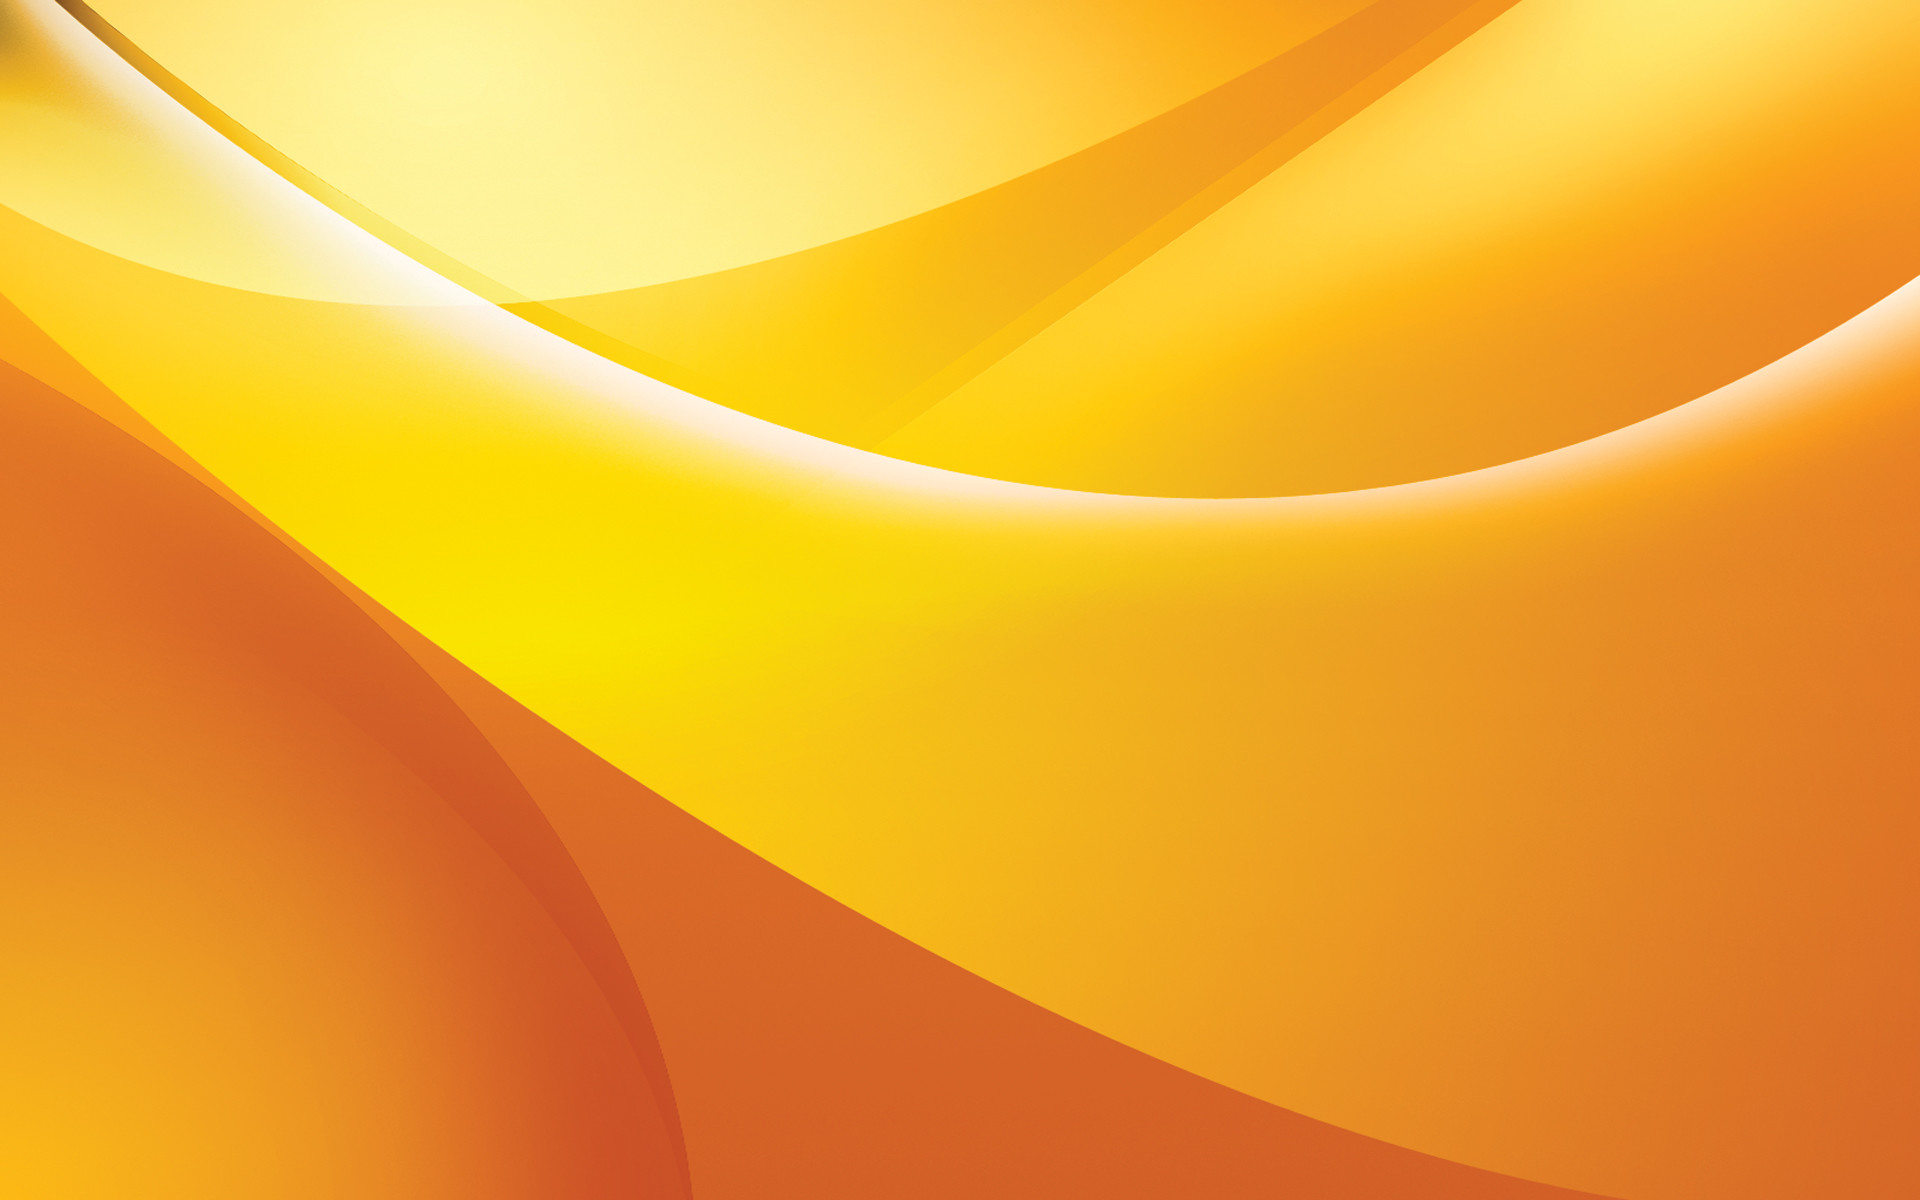 Abstract Orange Wallpaper 1450